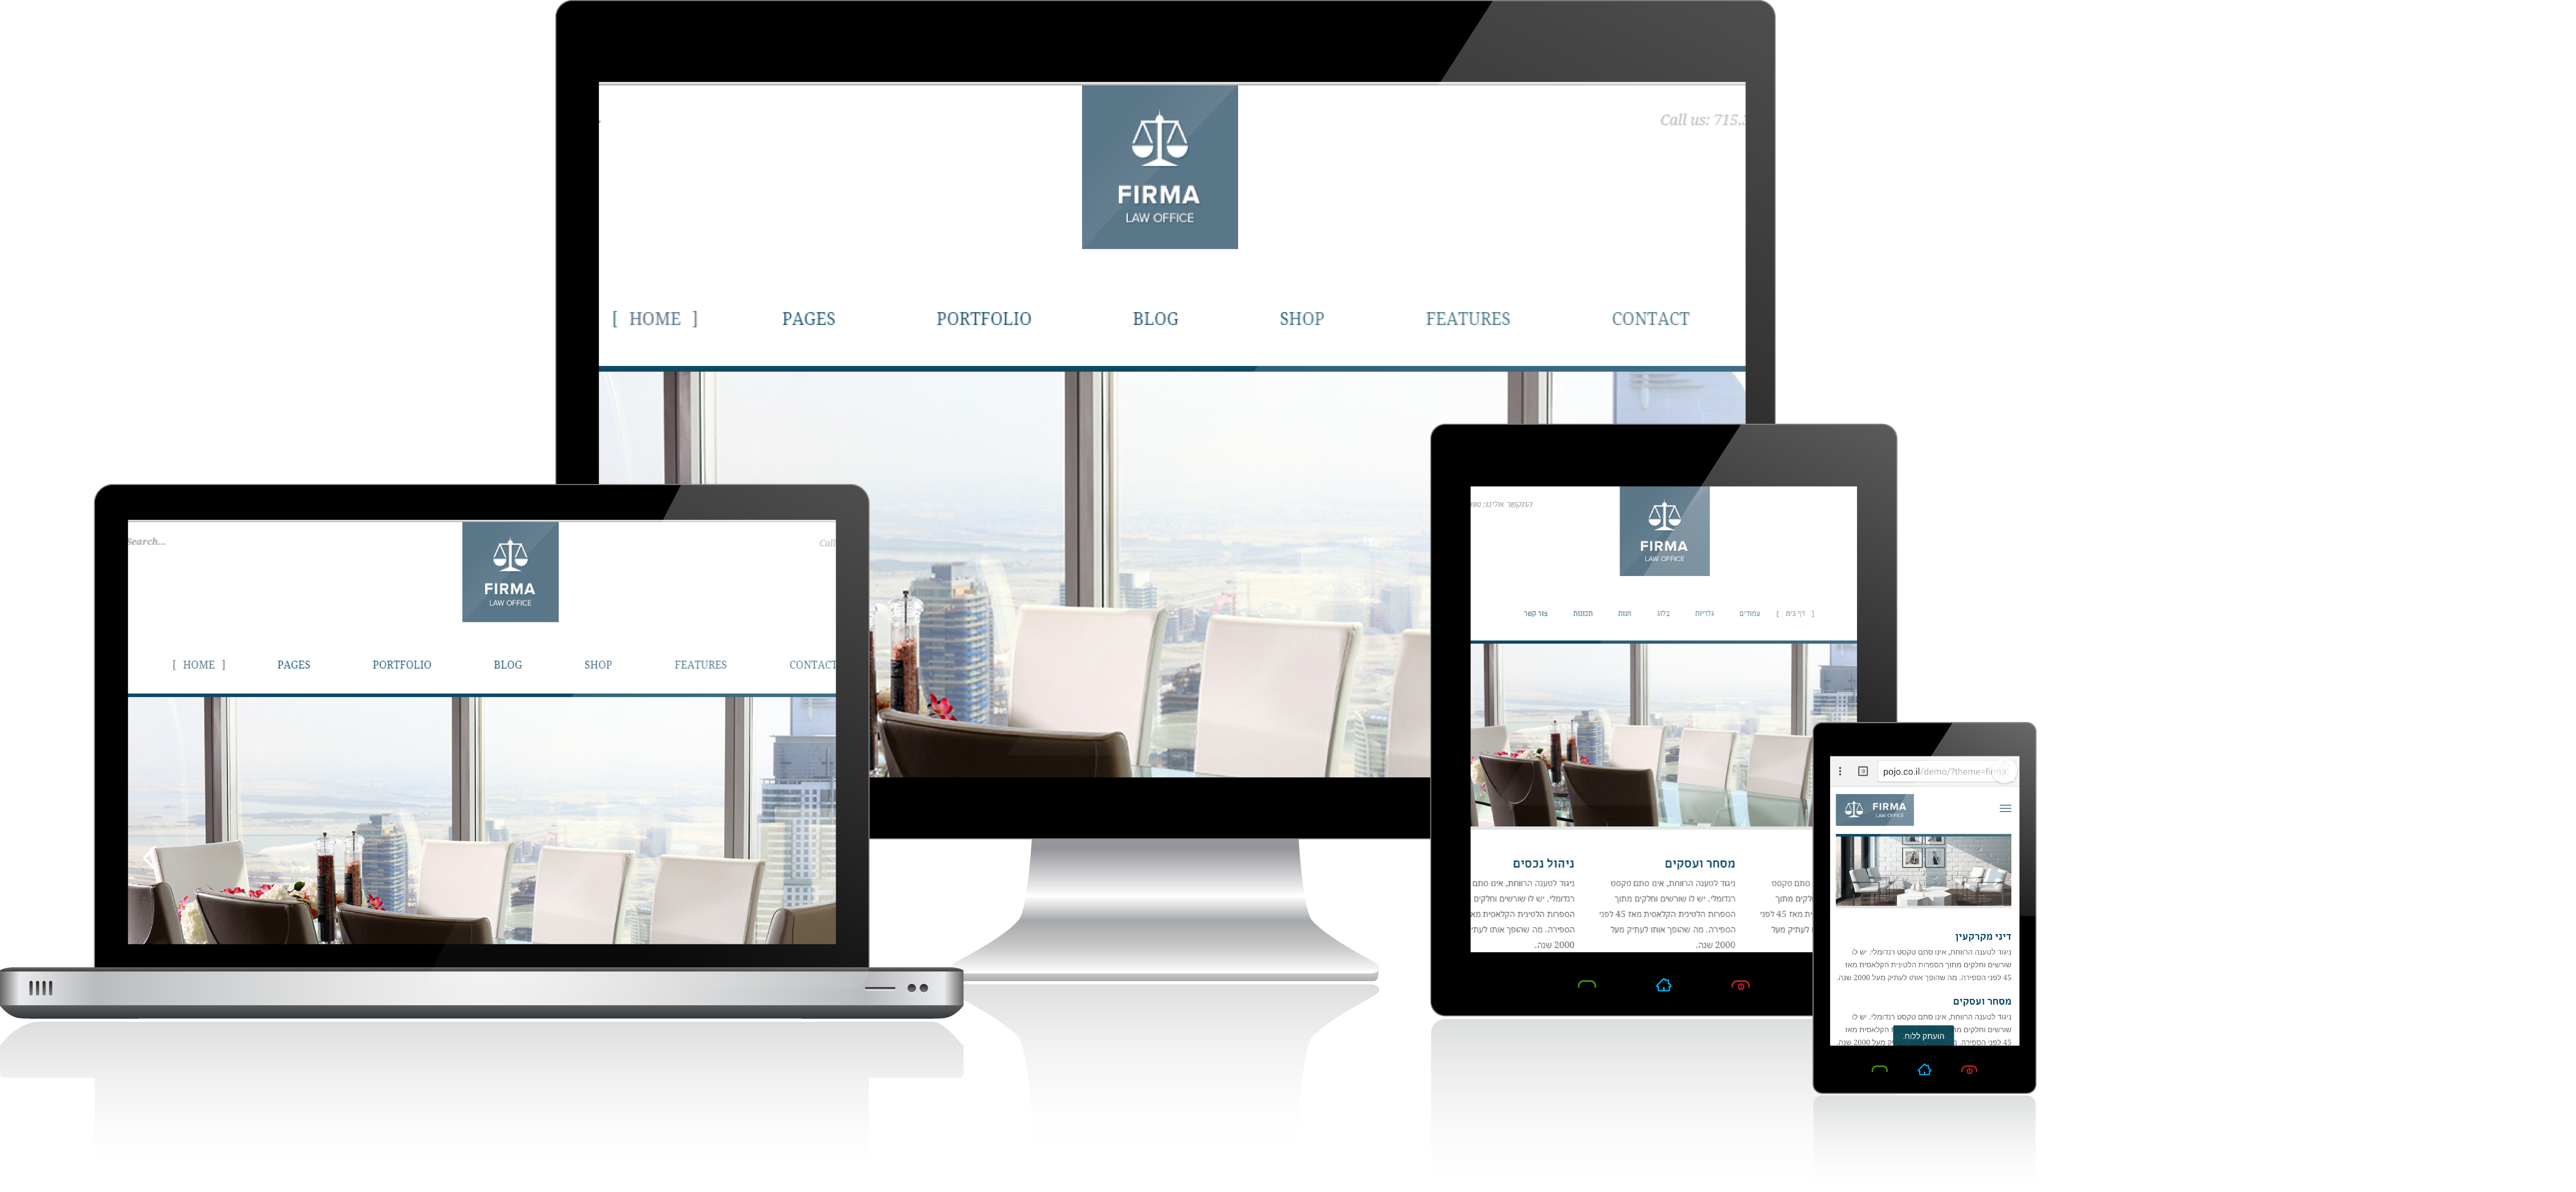 בניית אתרי אינטרנט לעורכי דין